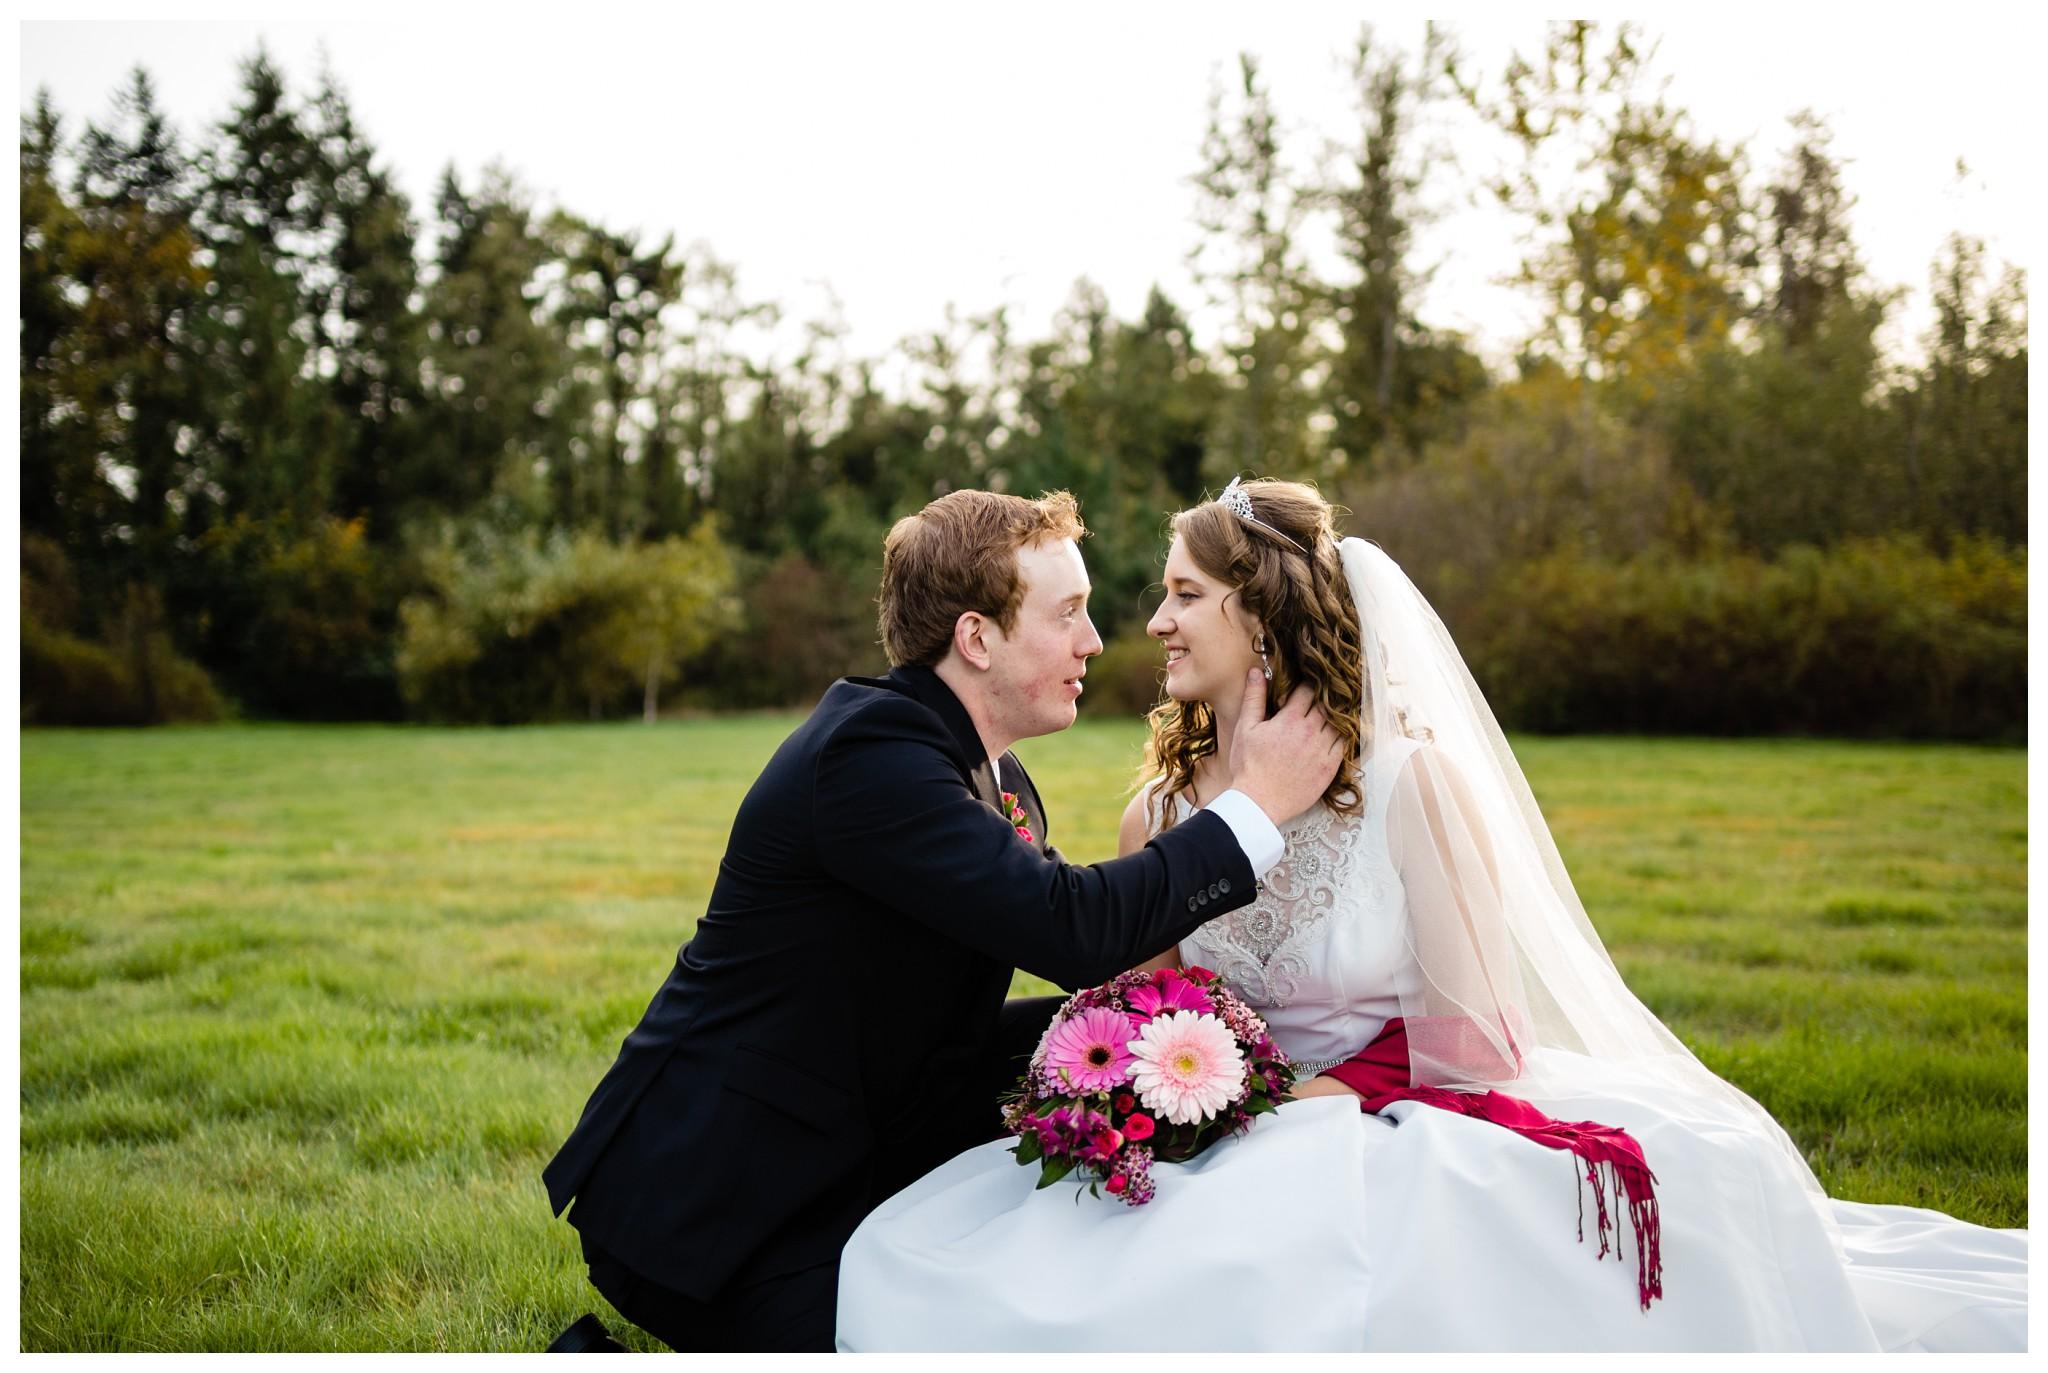 Aldergrove Park Christian Church Wedding Photography Pink Flowers Blue Bridesmaid Dress Fall_0119.jpg